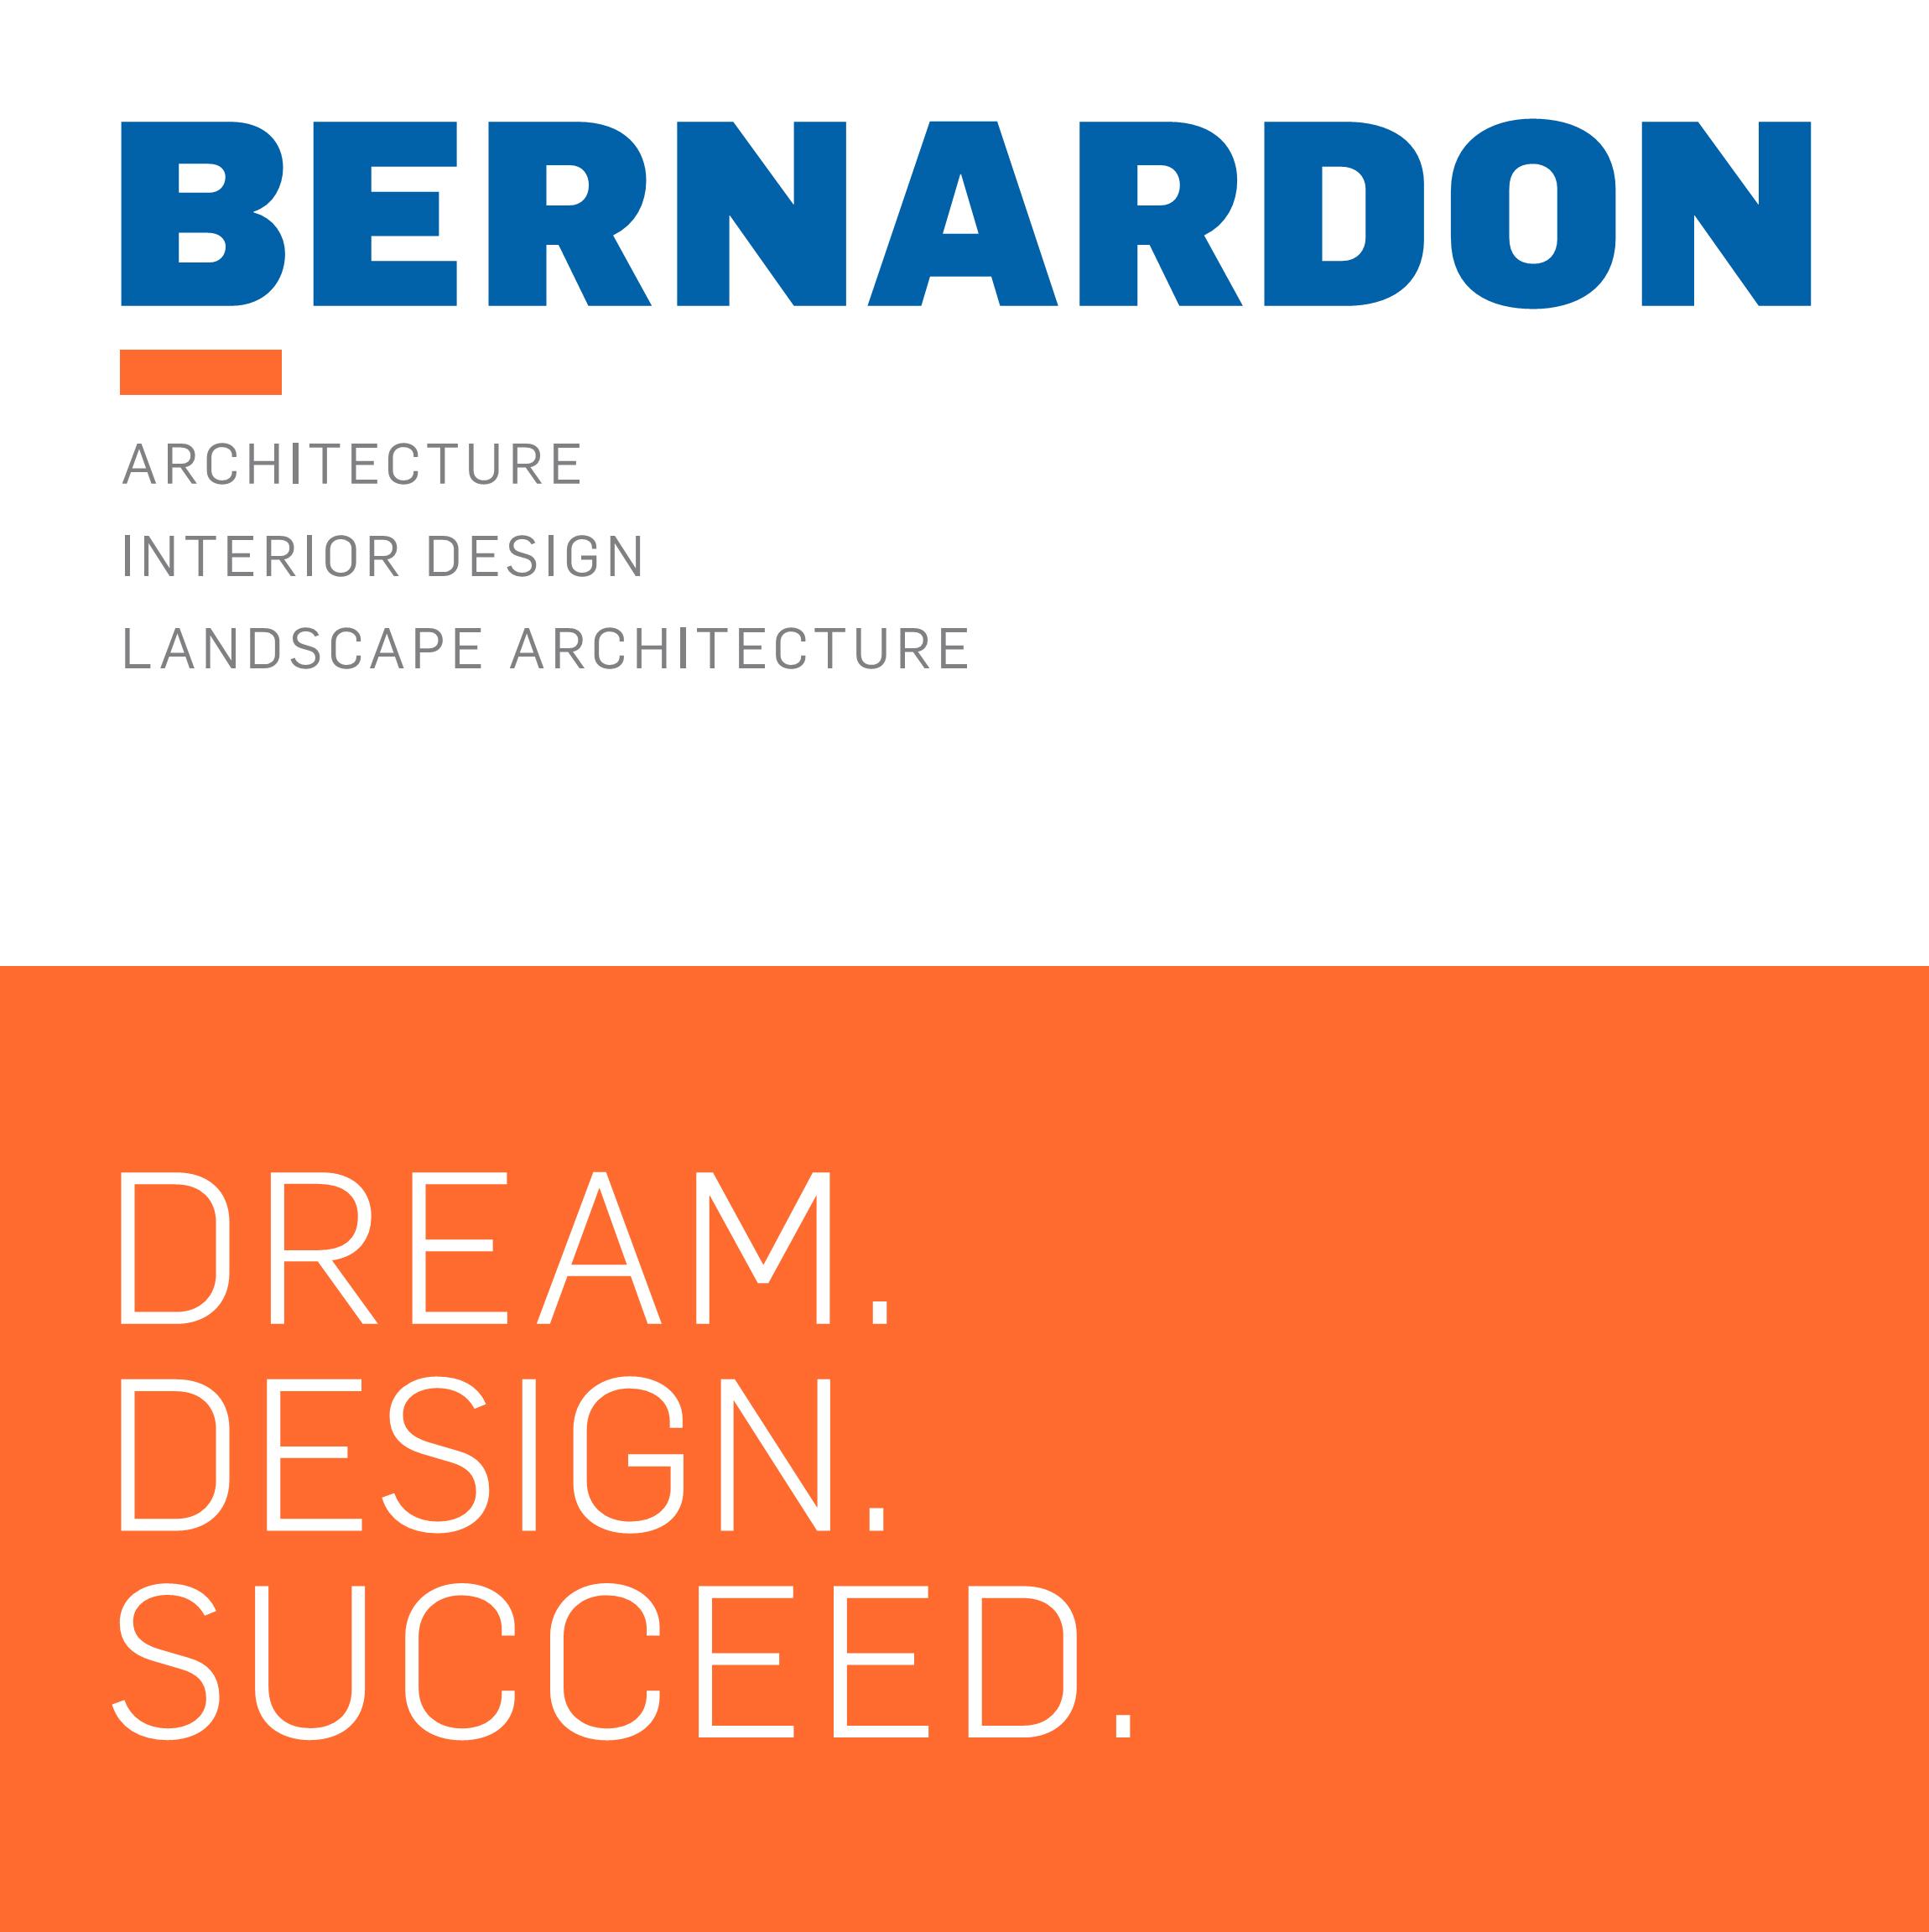 BERNARDON Firm Profile